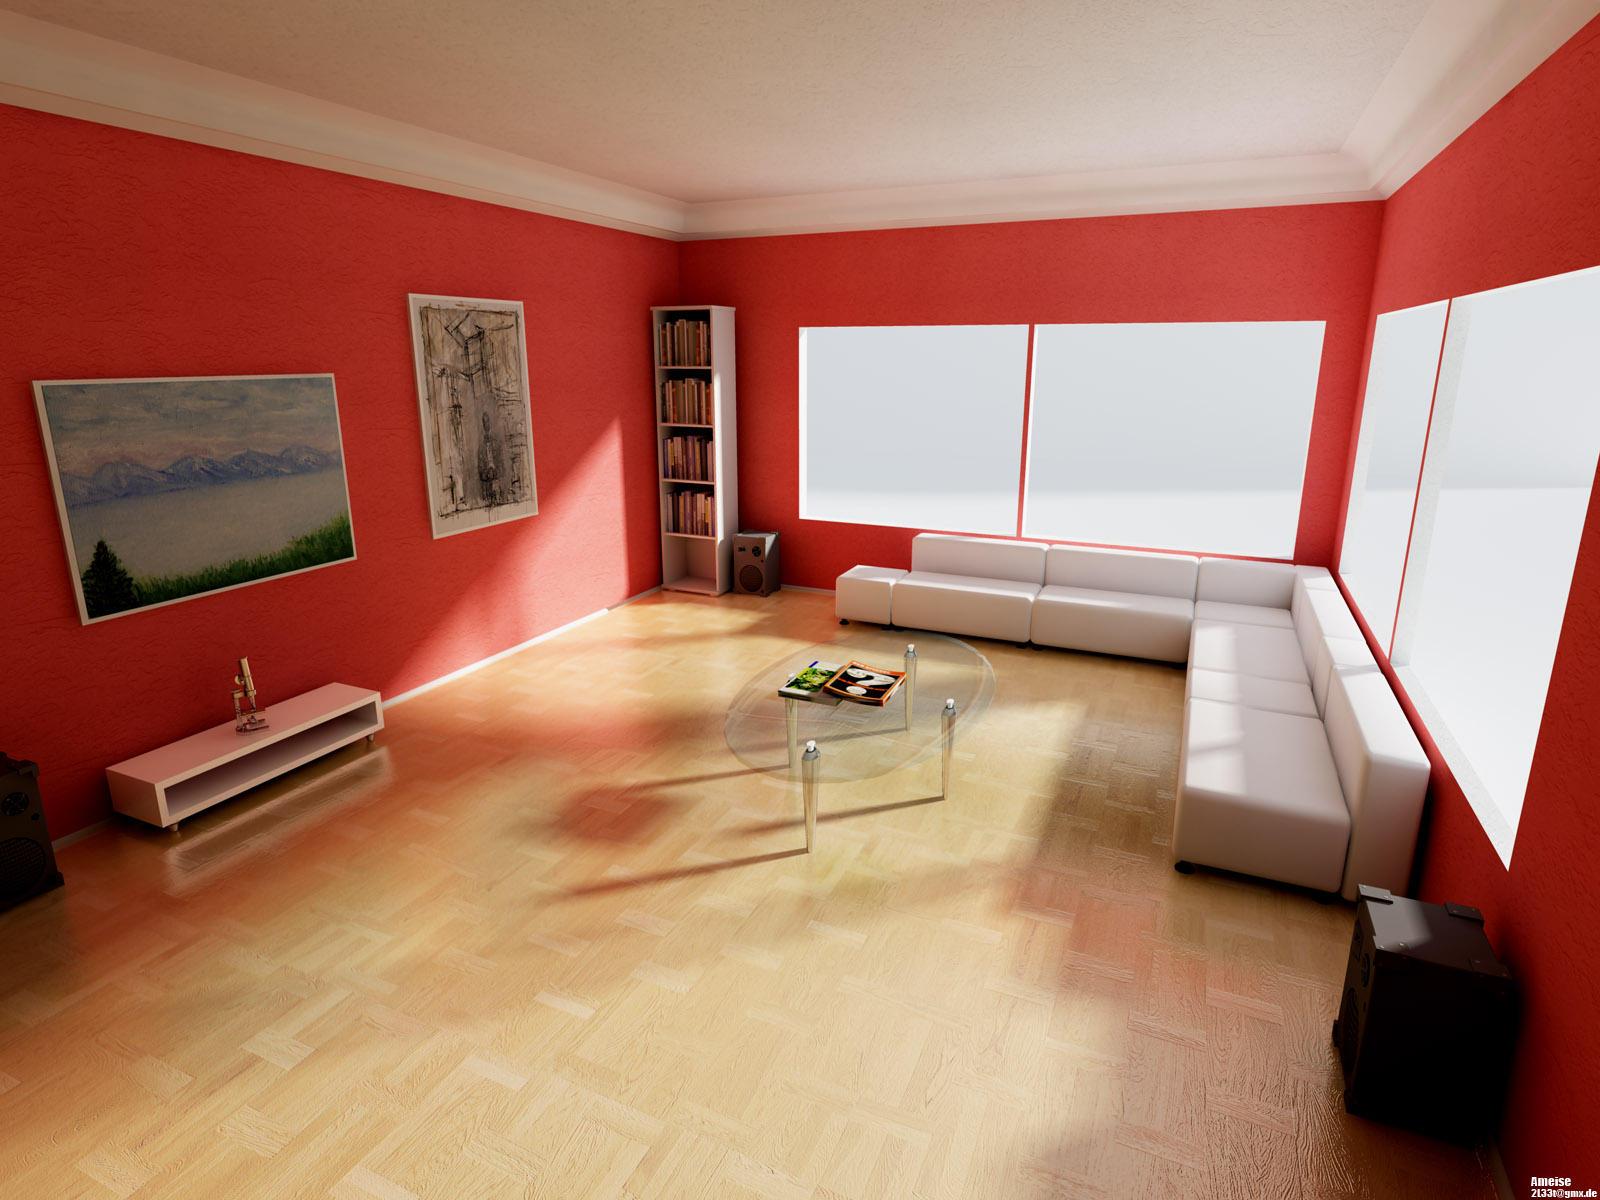 redroom | explore redroom on deviantart